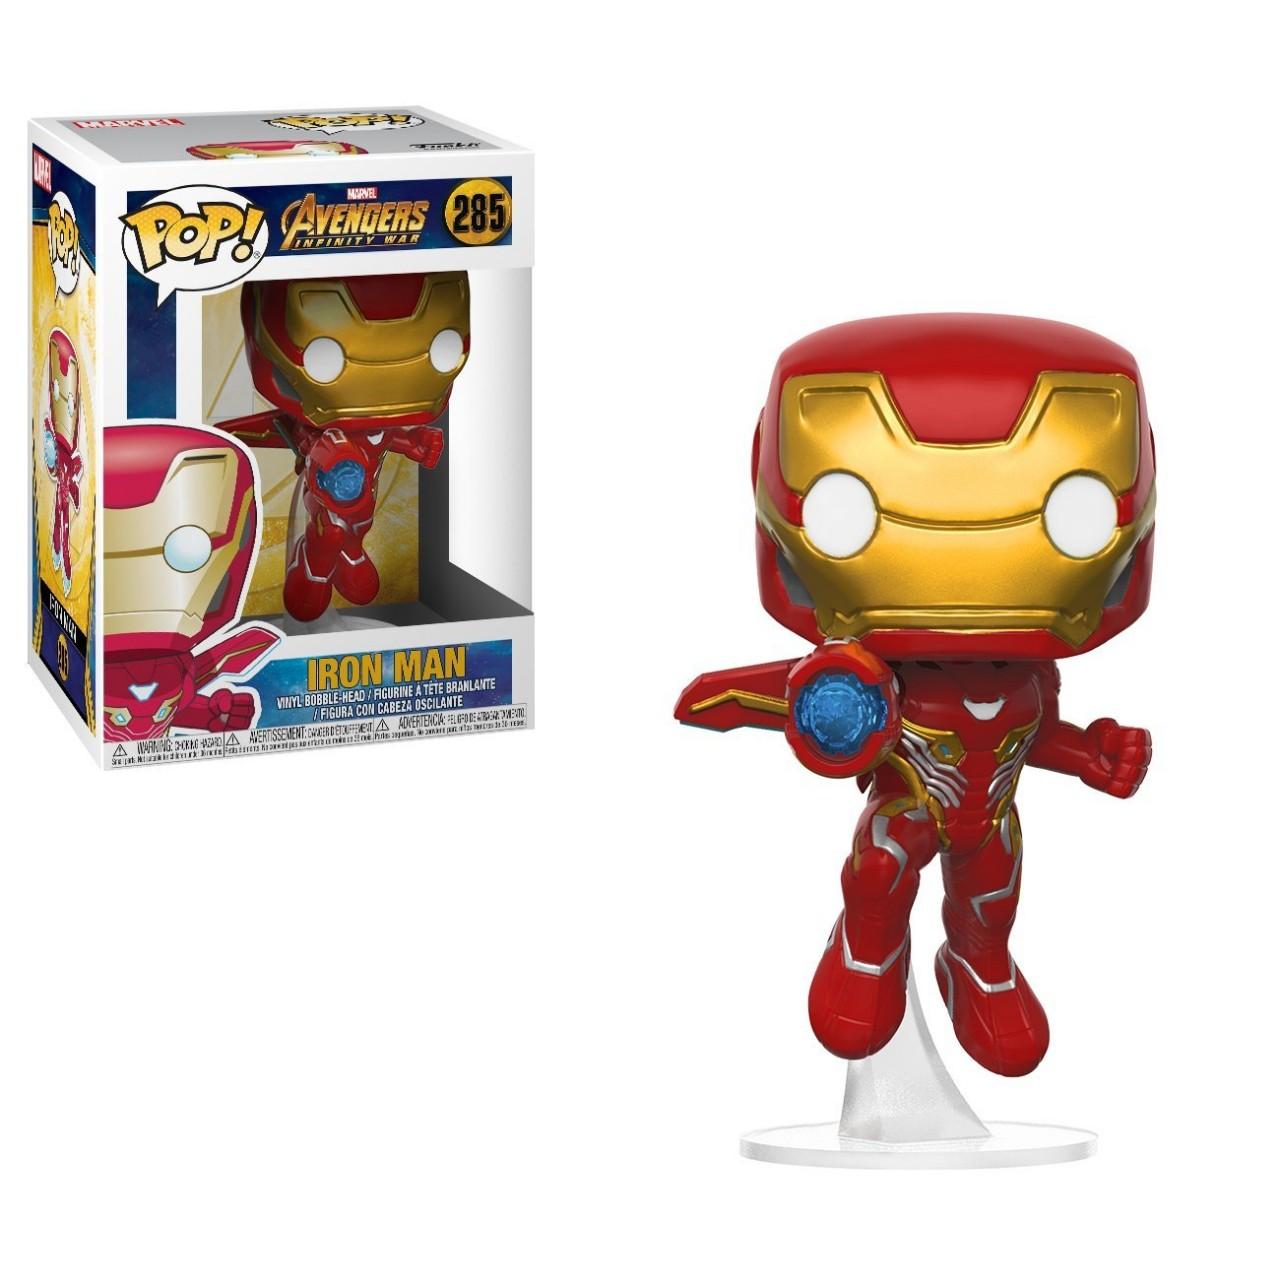 Фигурка Funko Pop Мстители Марвел: Железный Человек на подставке (26463) #285 Marvel Iron Man